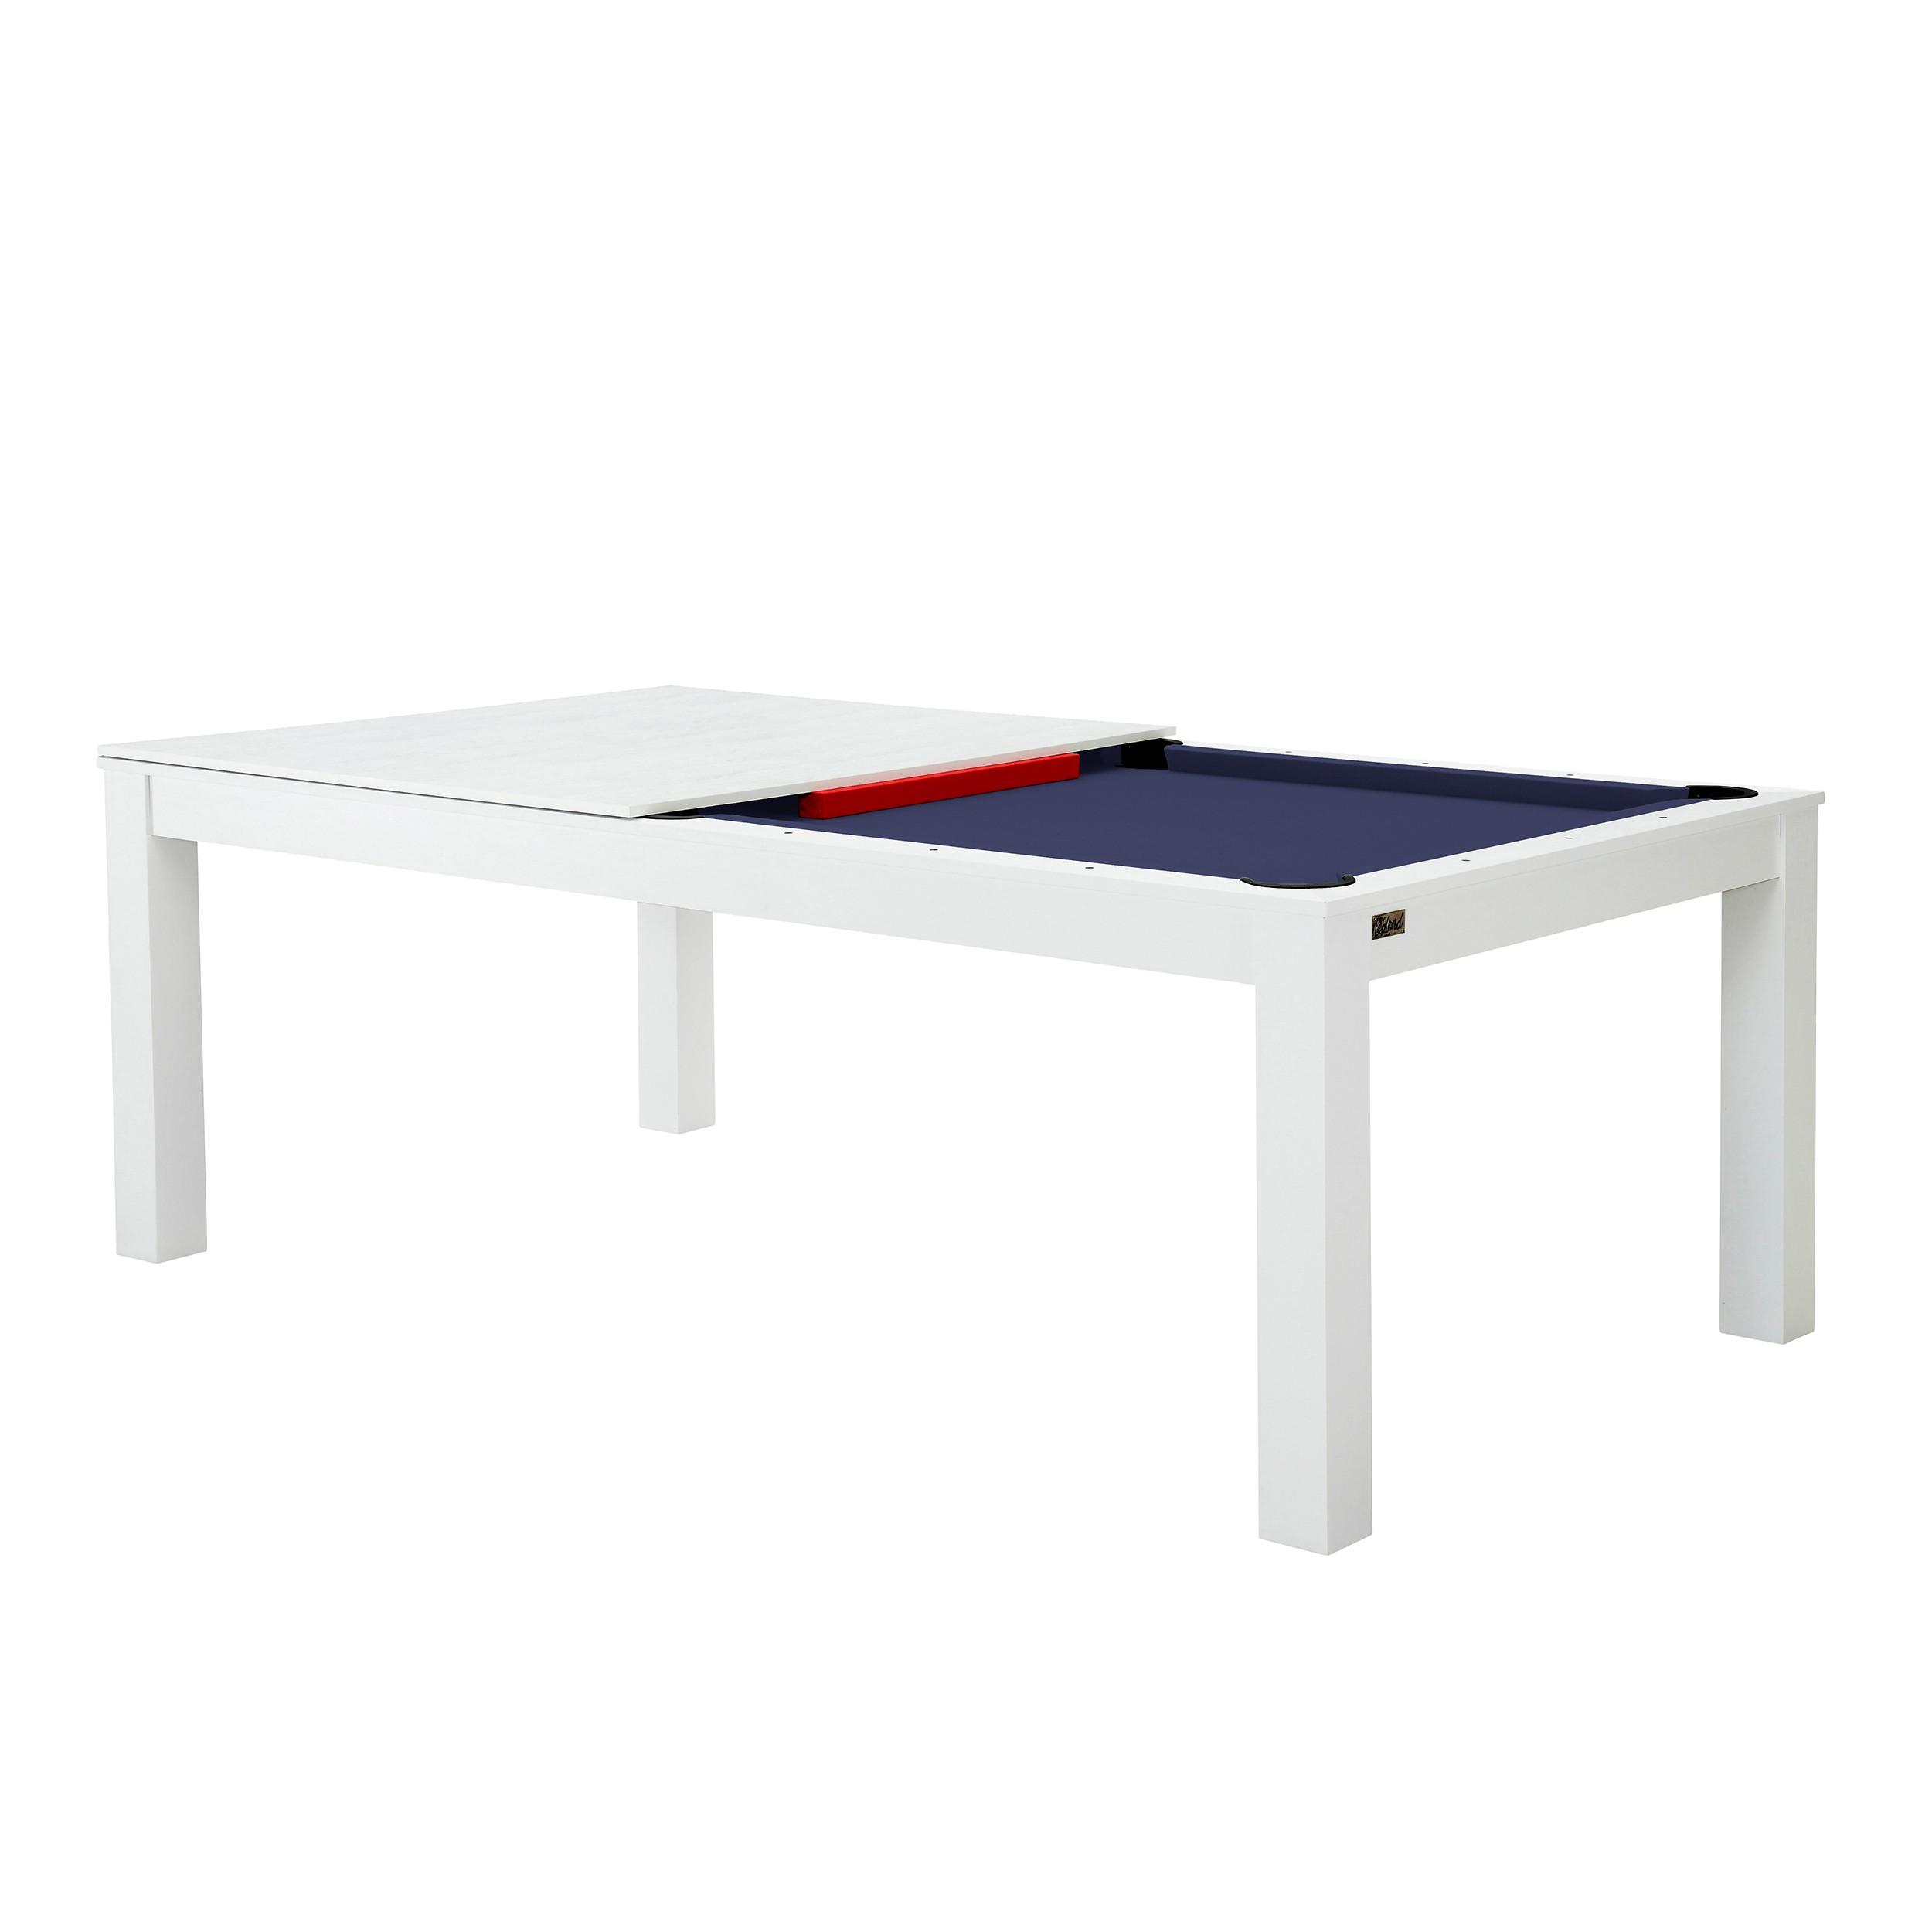 billard table convertible blanc tapis bleu testez nos billards tables convertibles blancs. Black Bedroom Furniture Sets. Home Design Ideas